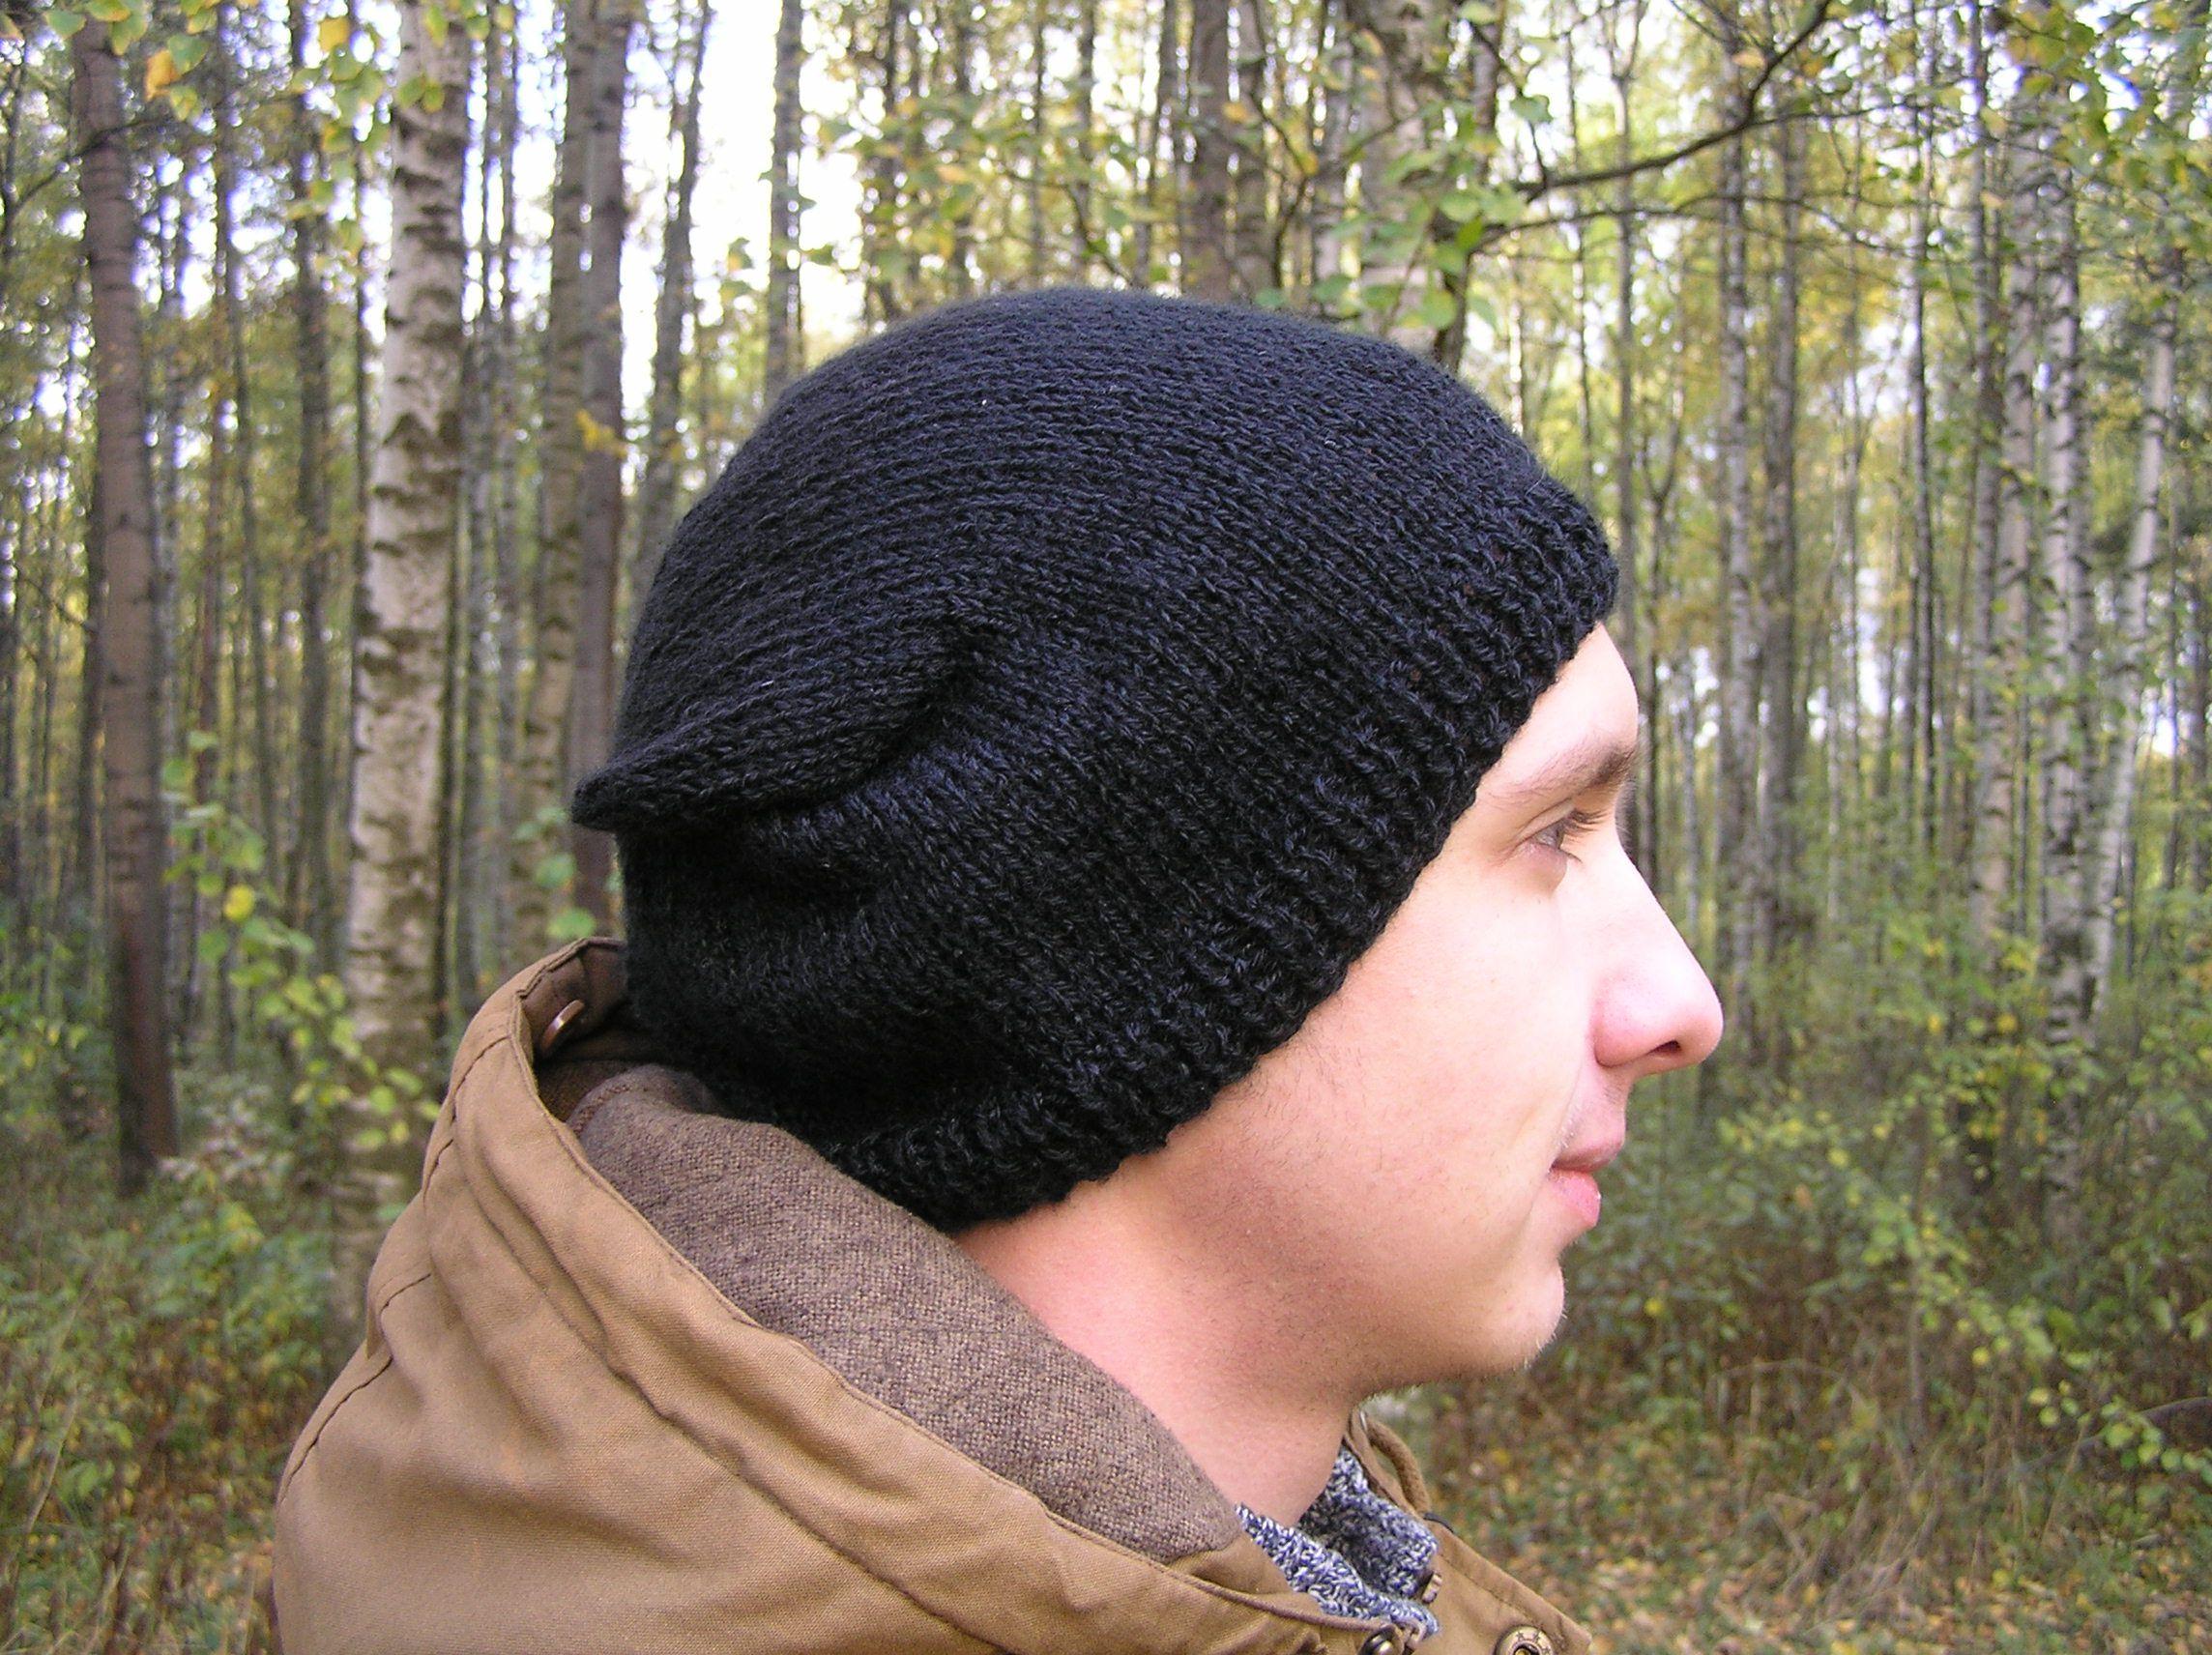 шапказимняя шапкавязаная шапкаосенная ужская шапка черный